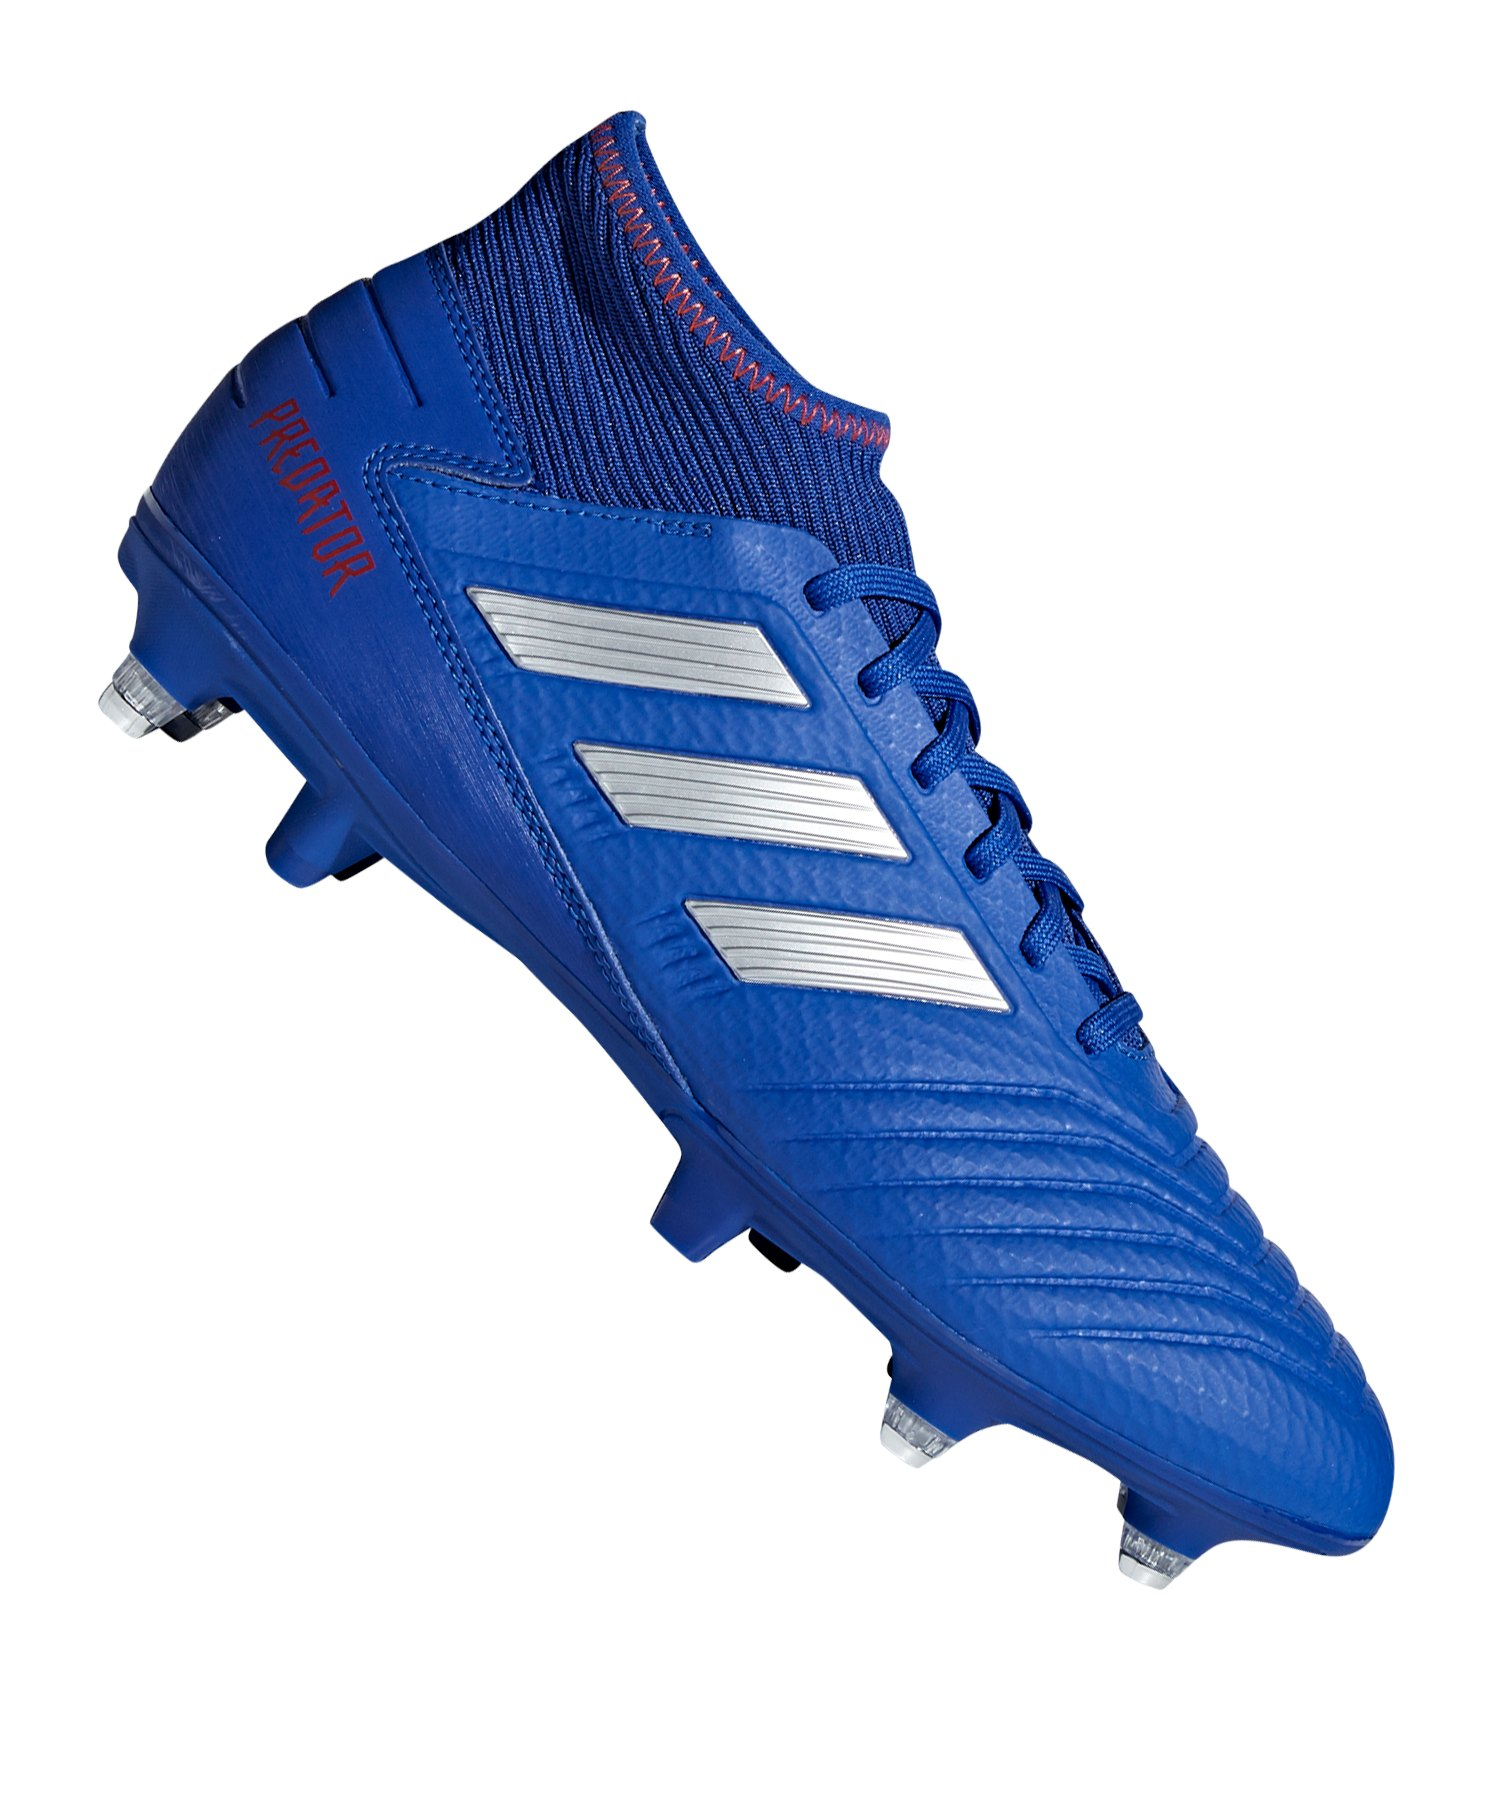 adidas Predator 19.3 SG Blau Silber - blau